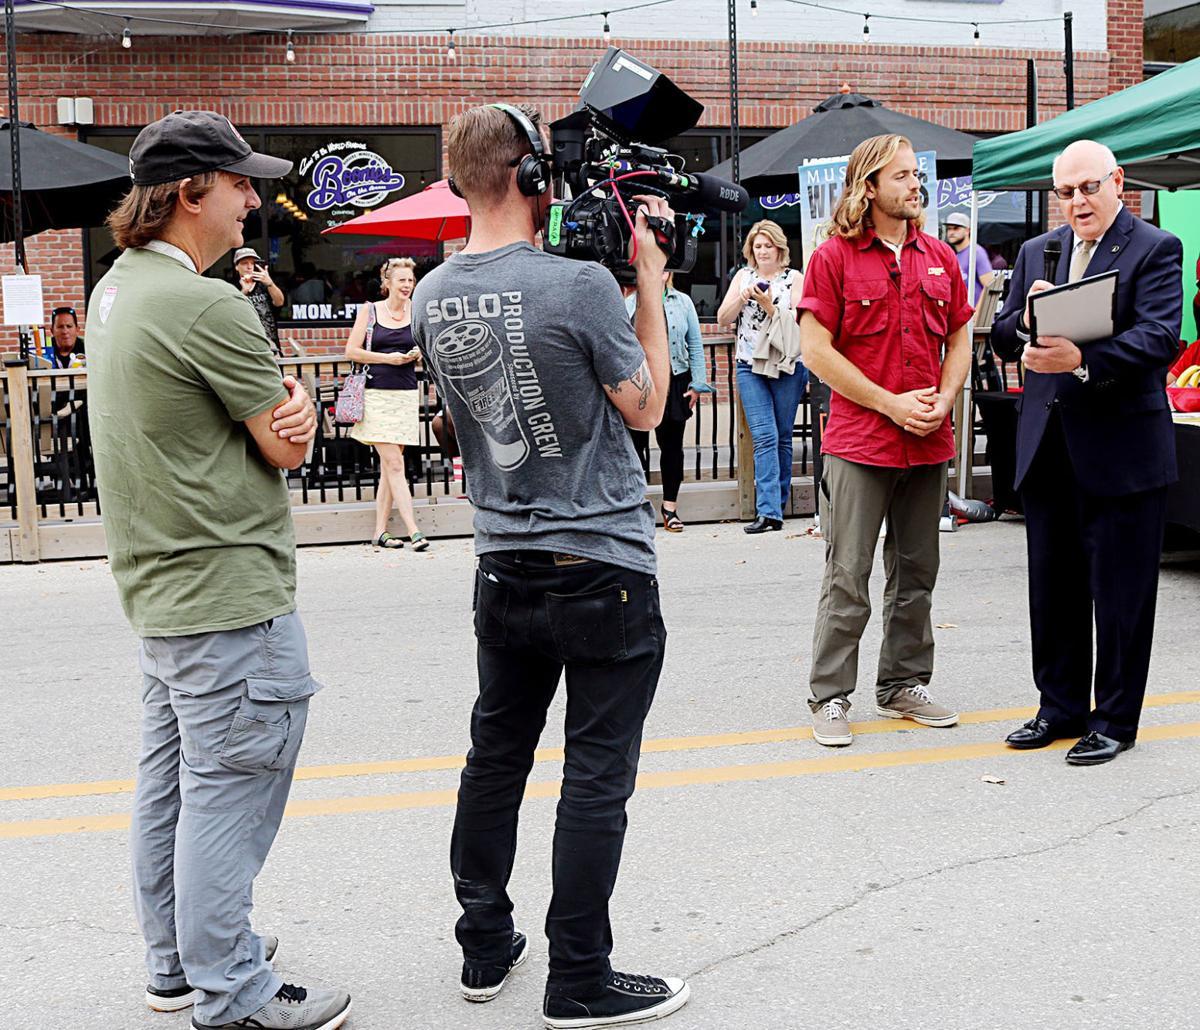 Amazon Series 'Fireball Run' Brings Celebrities, Race Cars